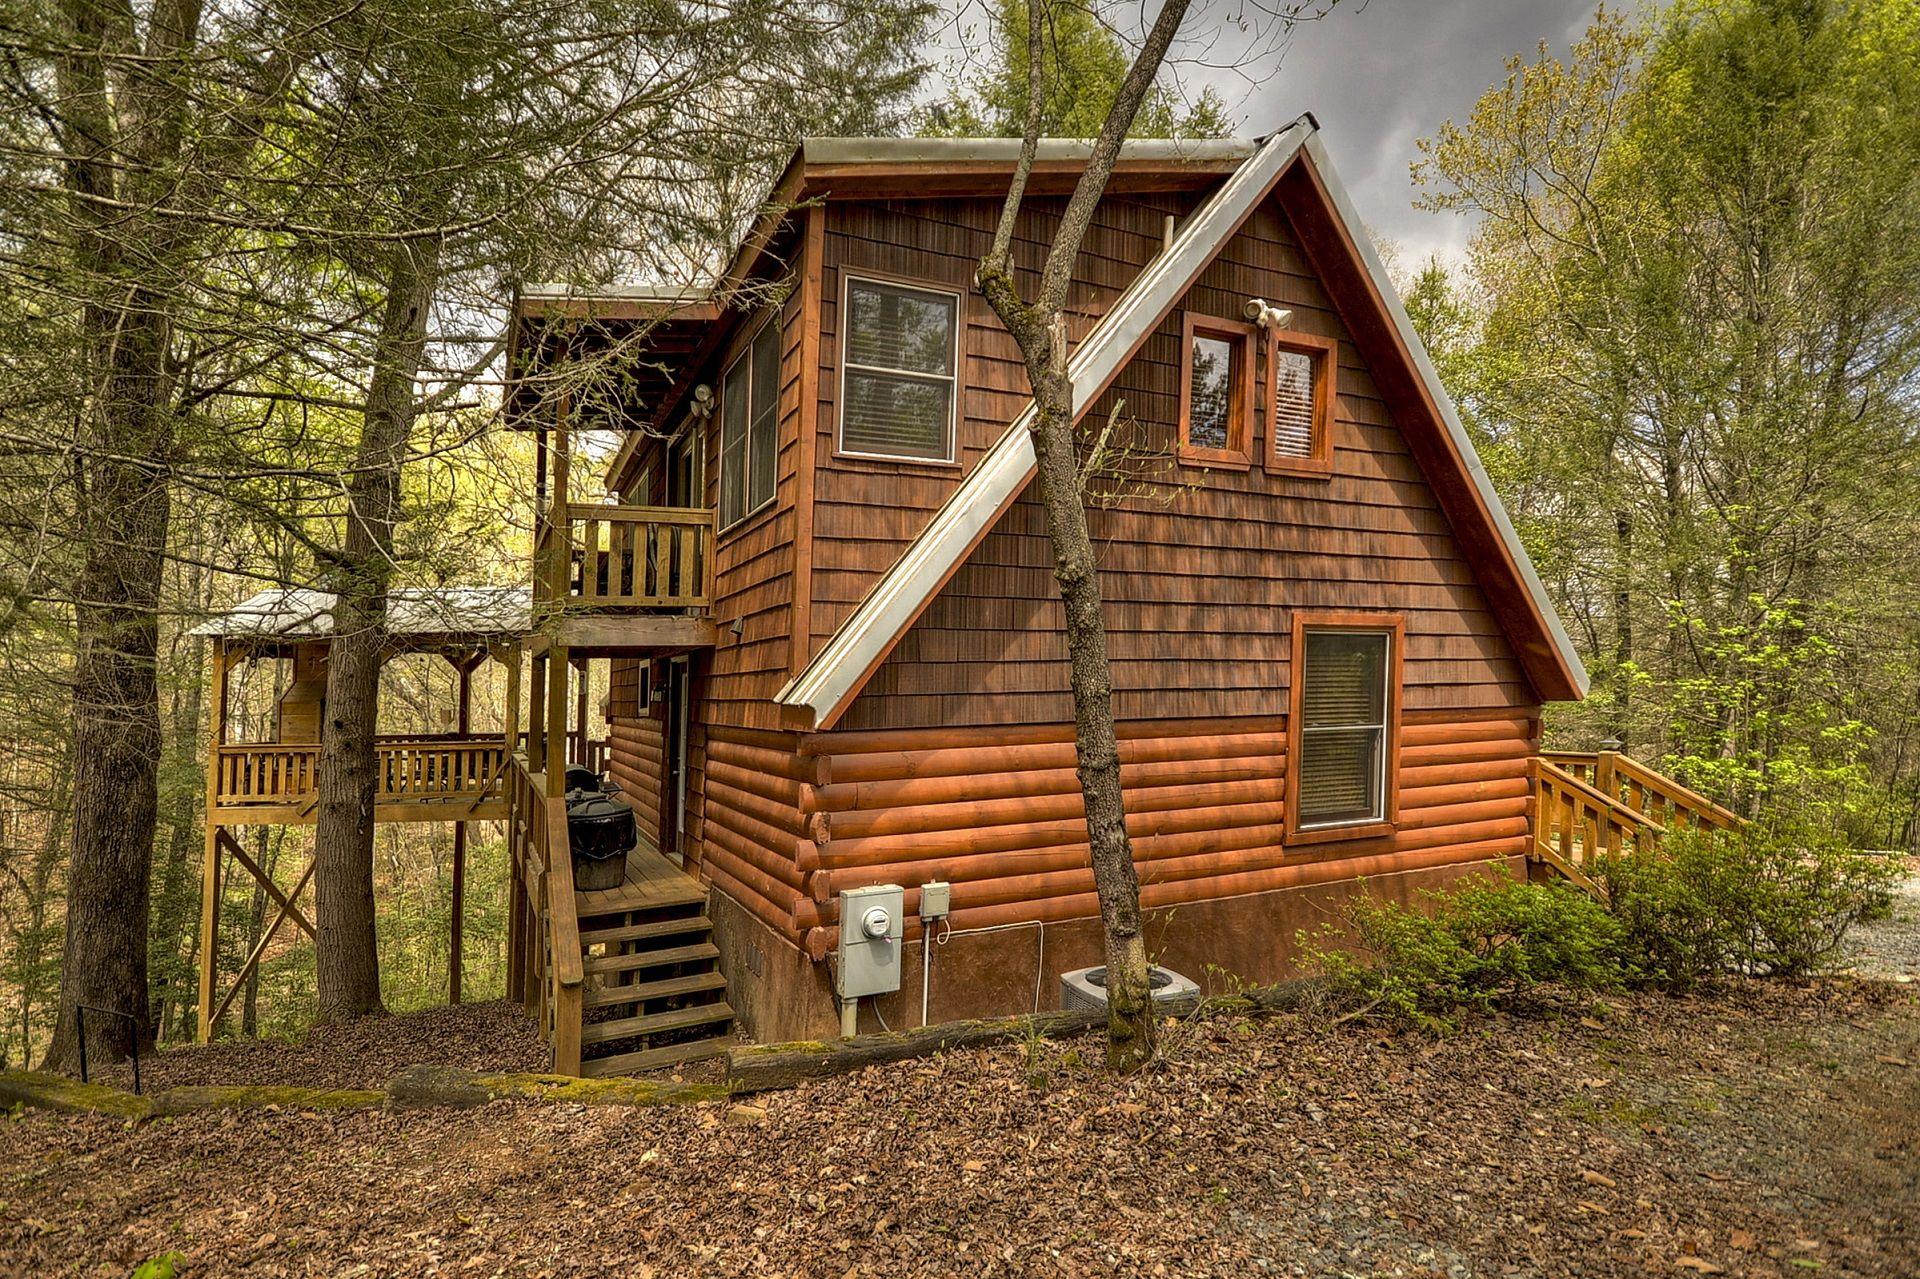 Broken Arrow Lodge Hot Tub Outdoor Living Area Wifi 10 Minutes To Ocoee Rafting And Blue Ridge Blue Ridge Cabin Rentals Georgia Cabin Rentals Georgia Cabins